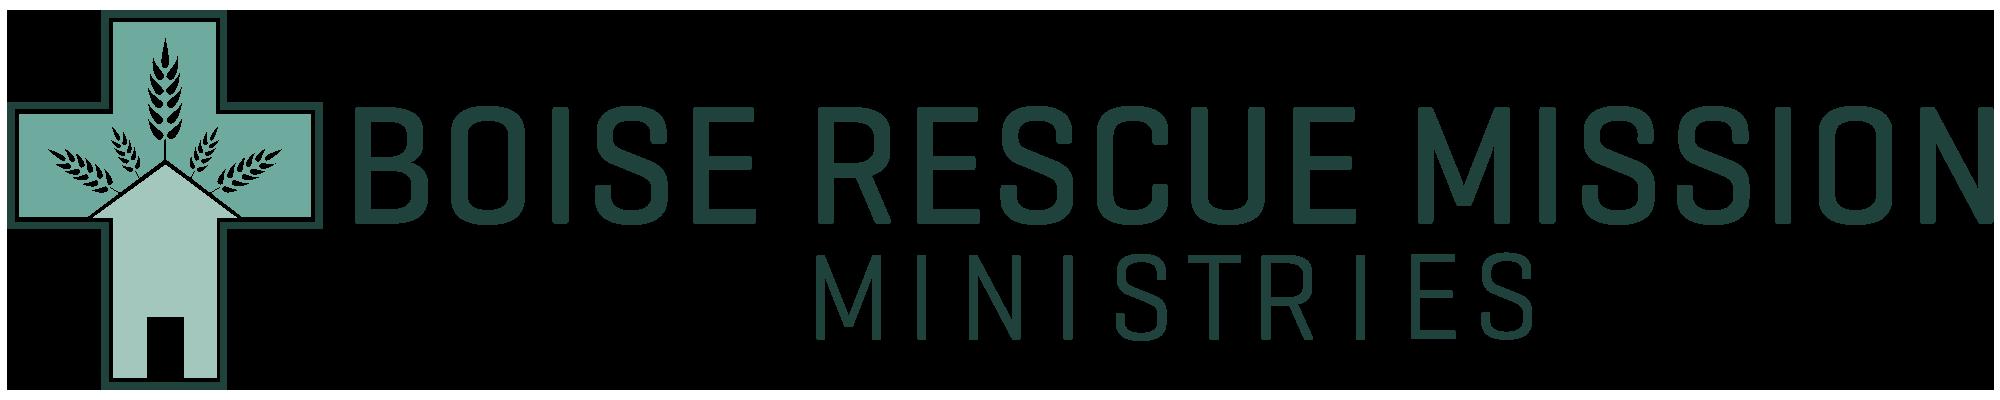 Boise Rescue Mission Ministries logo